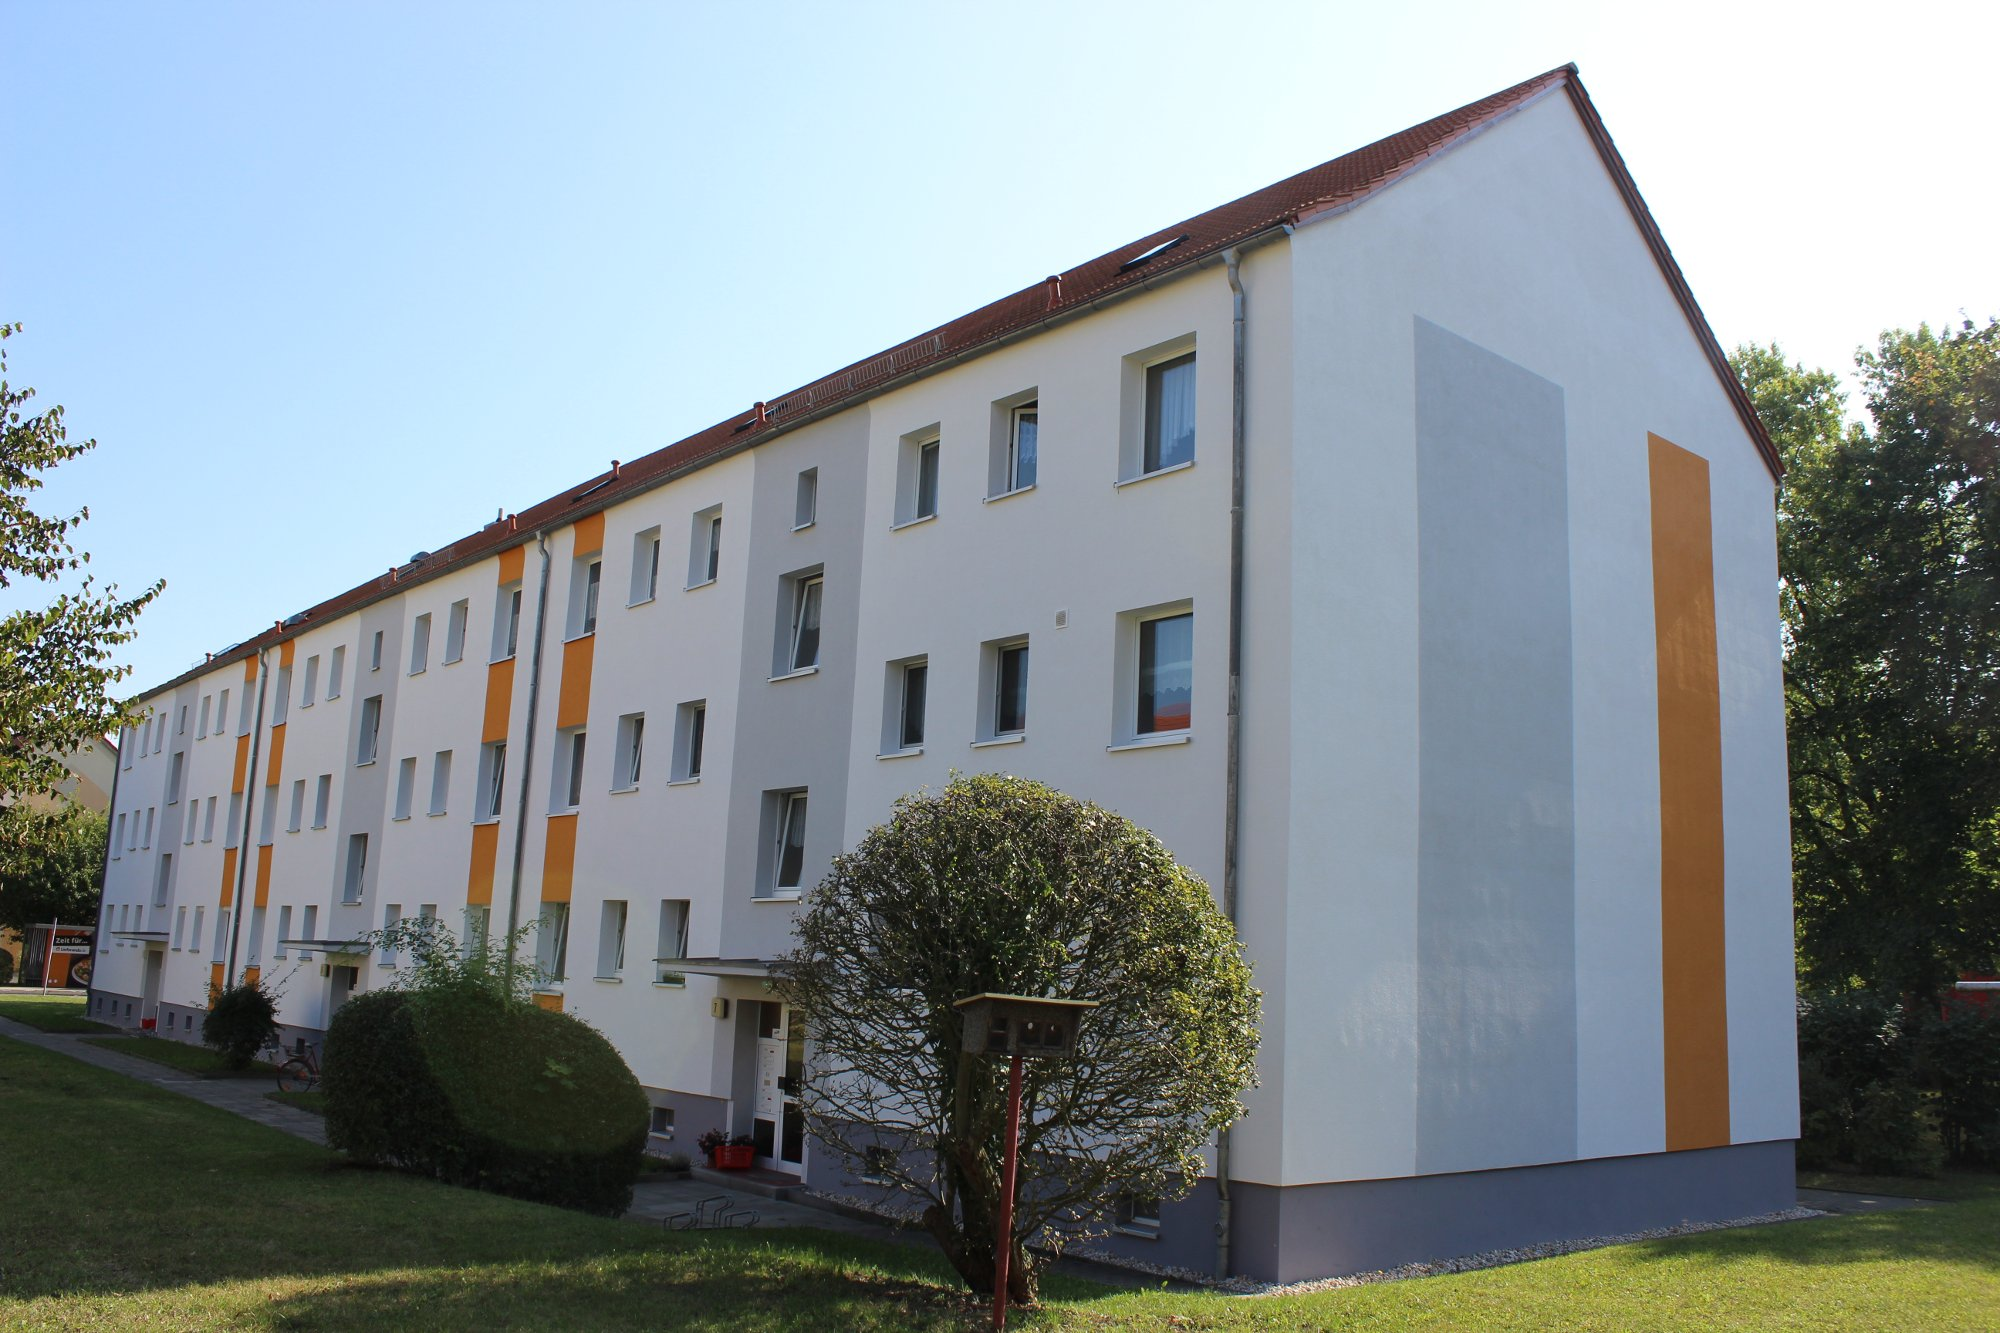 Fassadenanstrich in Borna - Nachher